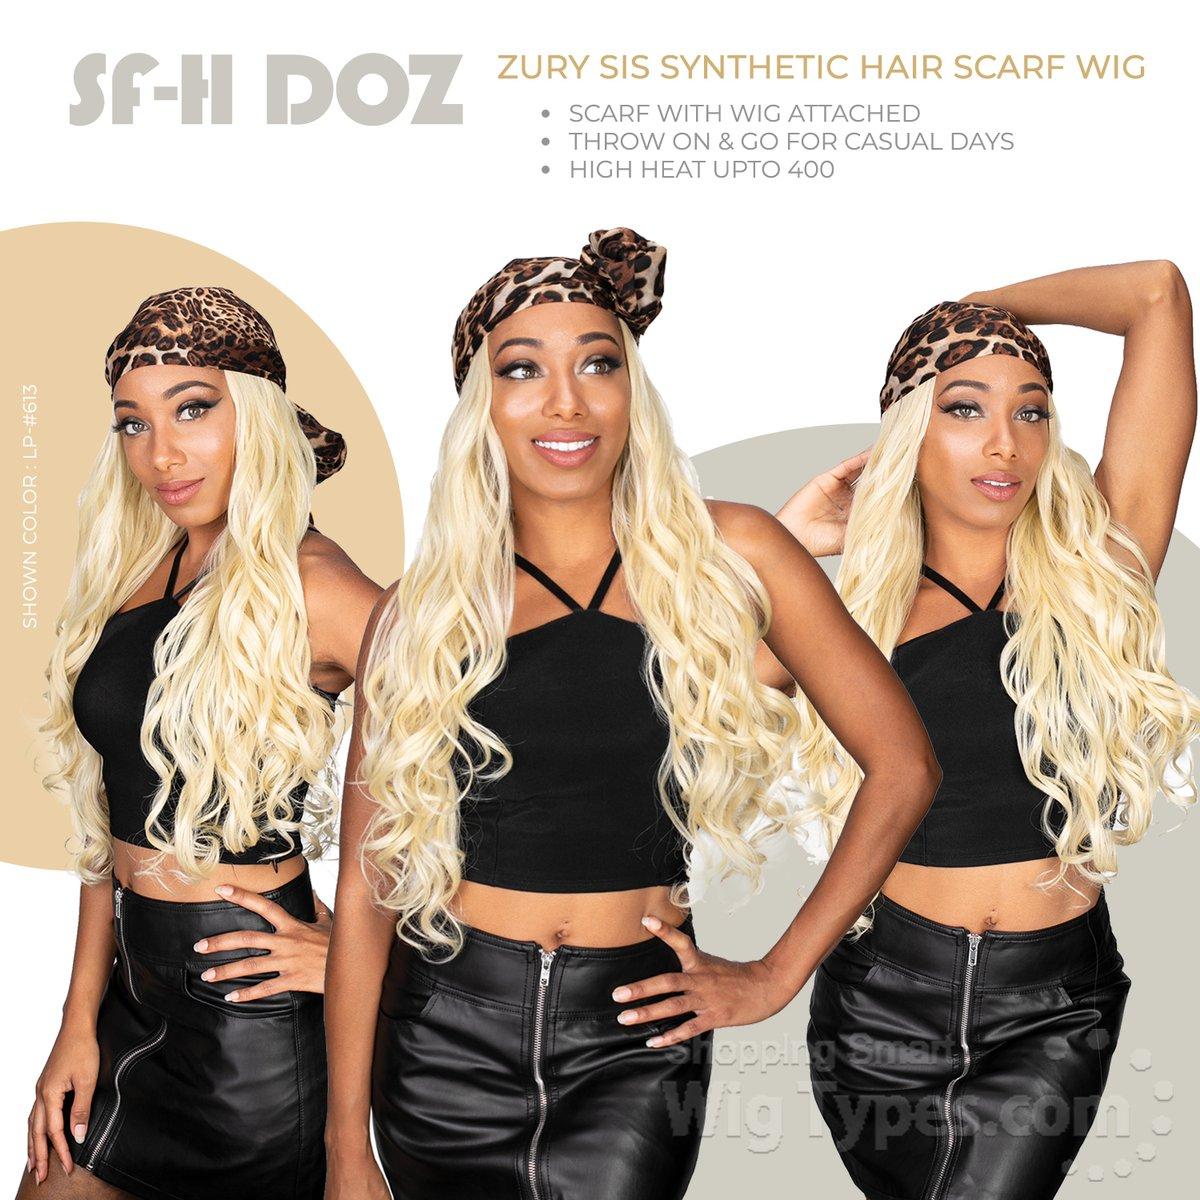 Zury Sis Synthetic Hair Scarf Wig - SF-H DOZ (https://soo.nr/AFwp)  Shown Color : LP-#613 . . . . #wigtypes #wigtypesdotcom #trendywig #protectivestyles #blackgirlhair #blackgirlmagic #instawig #Longwigs #scarfwig #zurysis #scarfwithwigattached #sfhdozpic.twitter.com/gBxY8nbq7o